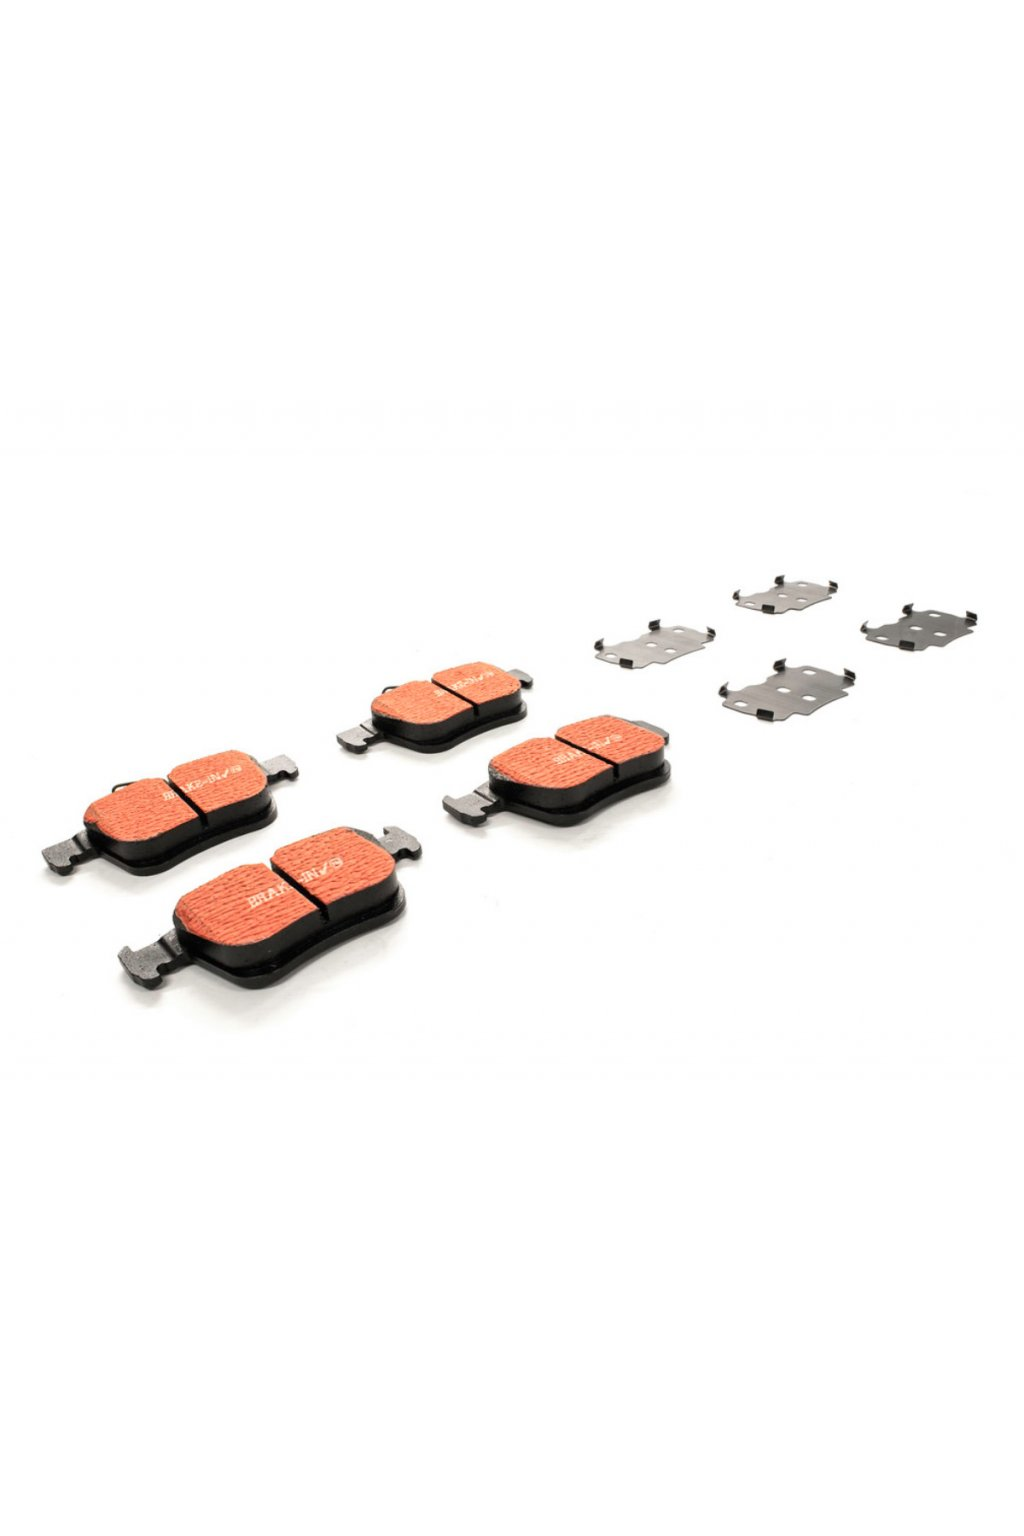 racingline performance zadni brzdove desky rp700 pro vozy platformy mqb s kotouci 310 x 22 mm pouze pro vozy s el park brzdou 2020115145451